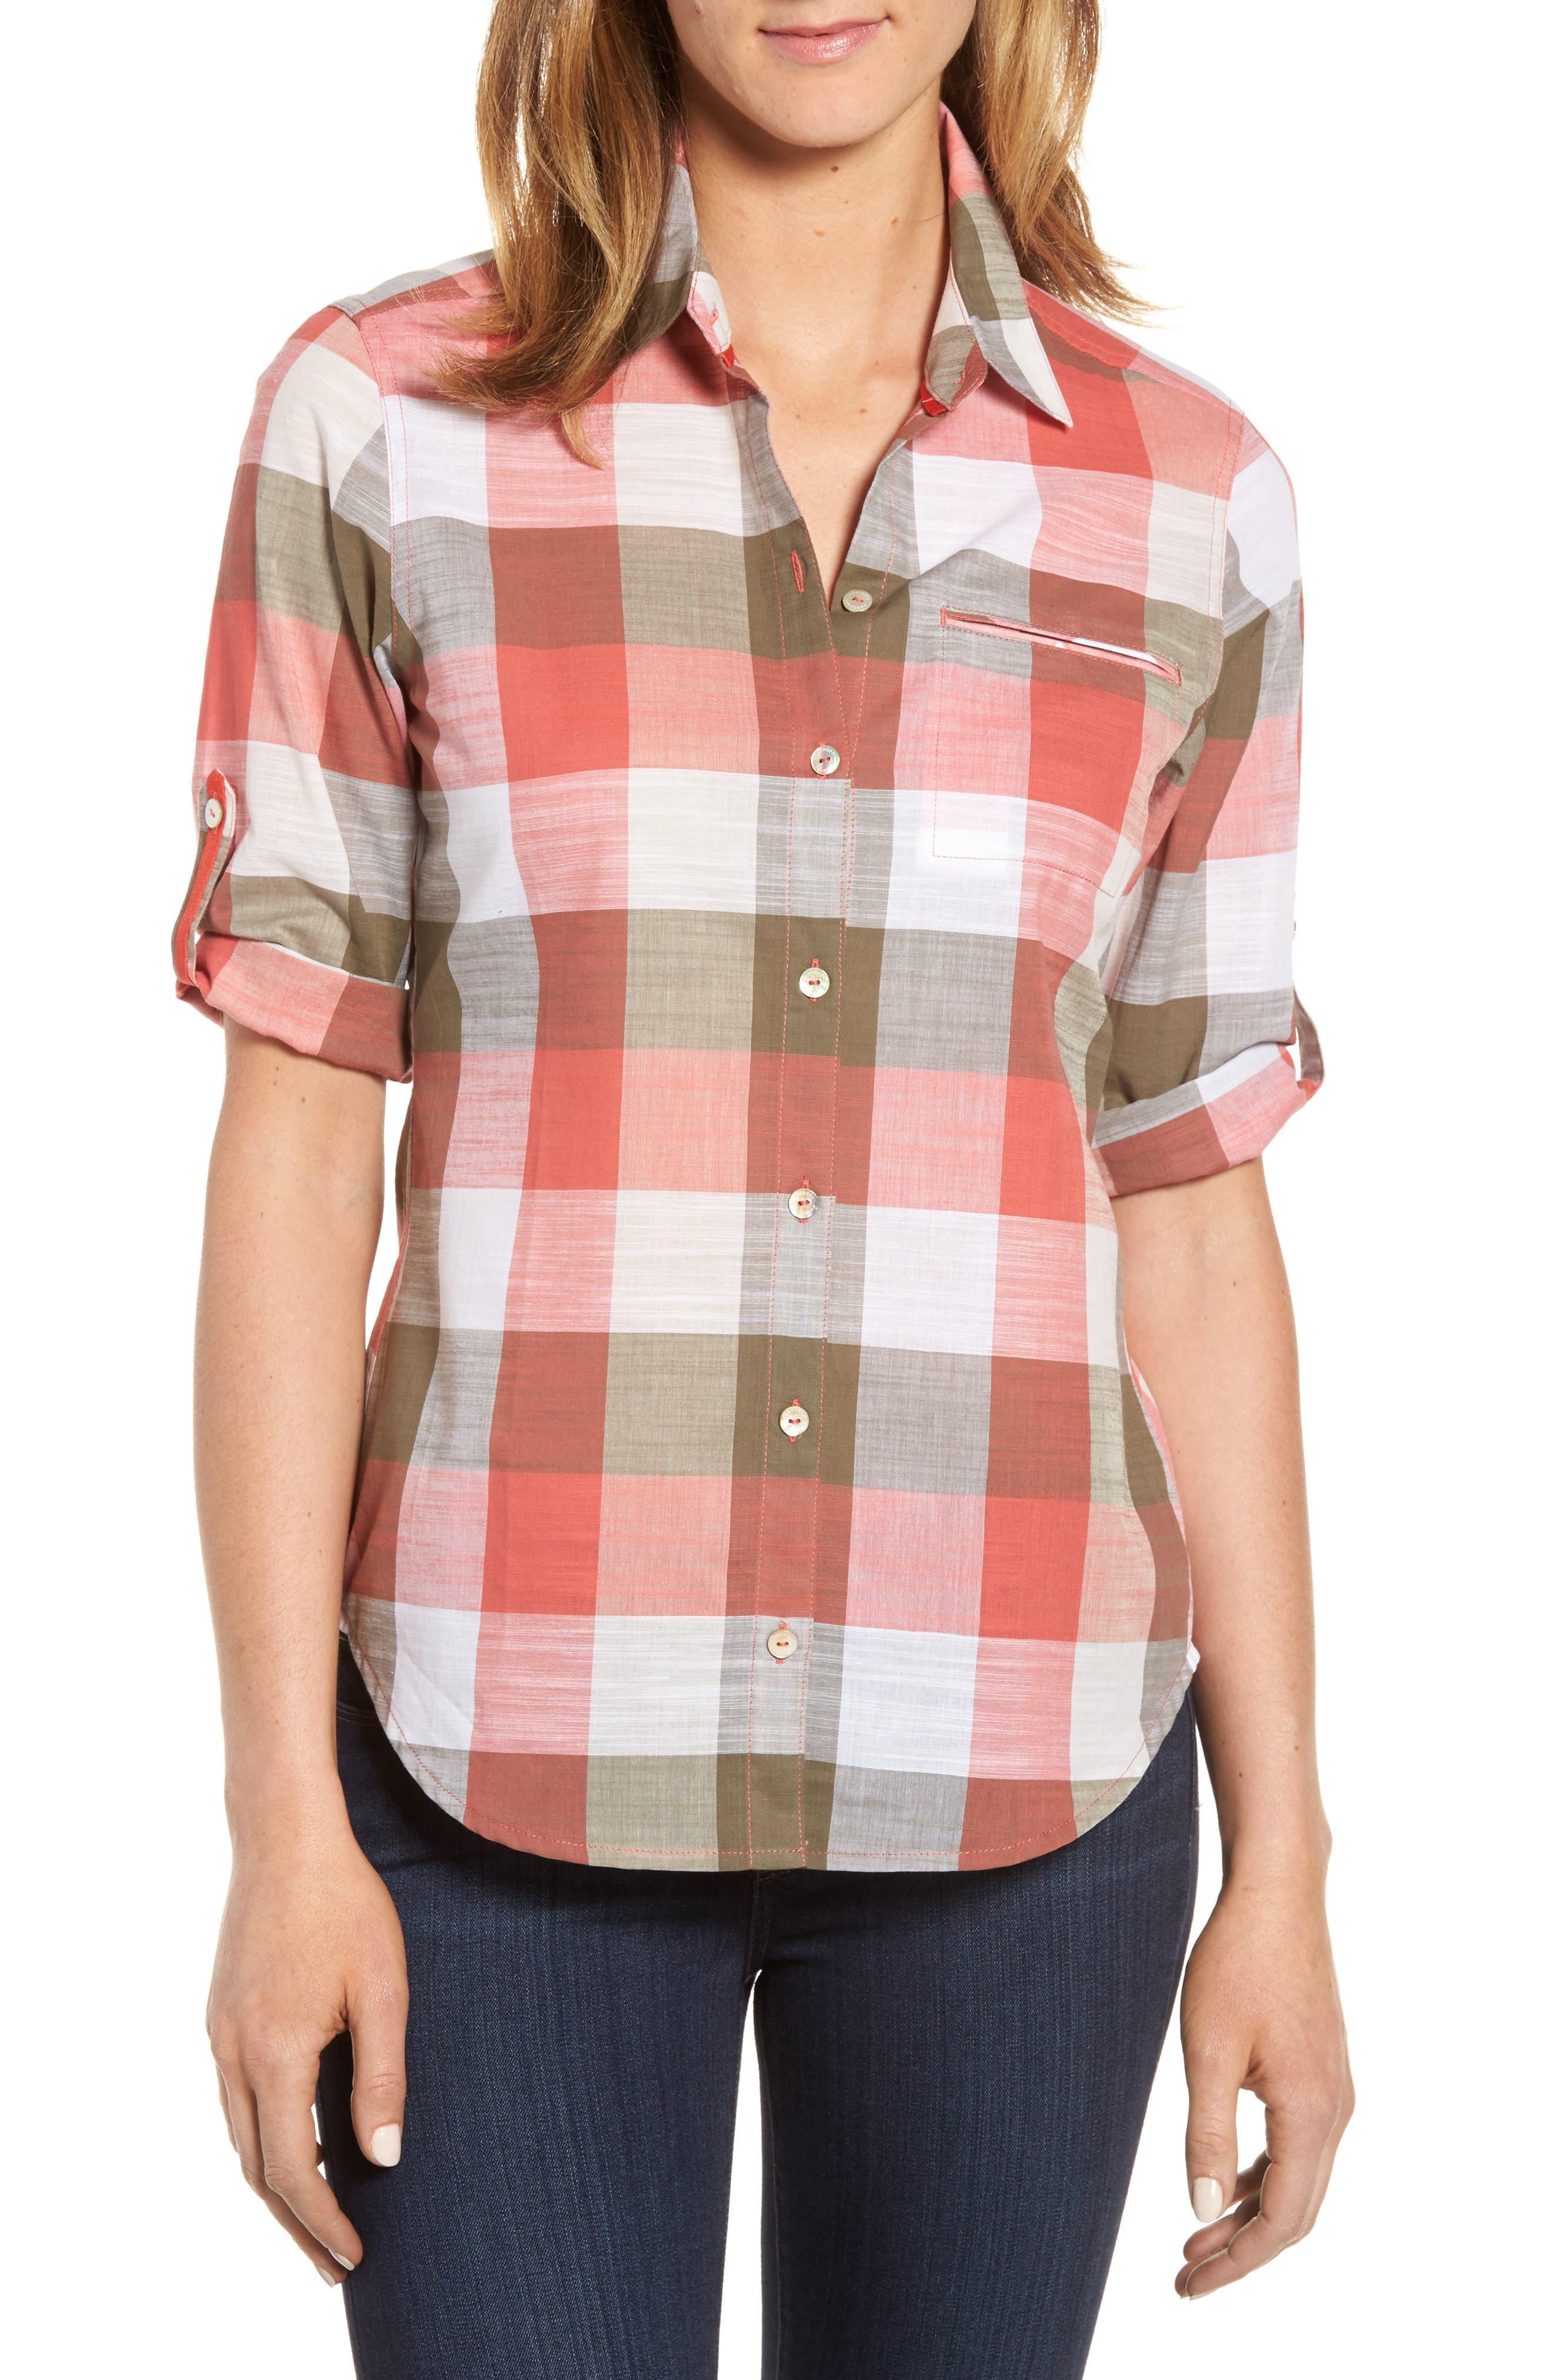 Alternate Image 1 Selected - Foxcroft Reese Buffalo Check Shirt (Regular & Petite)